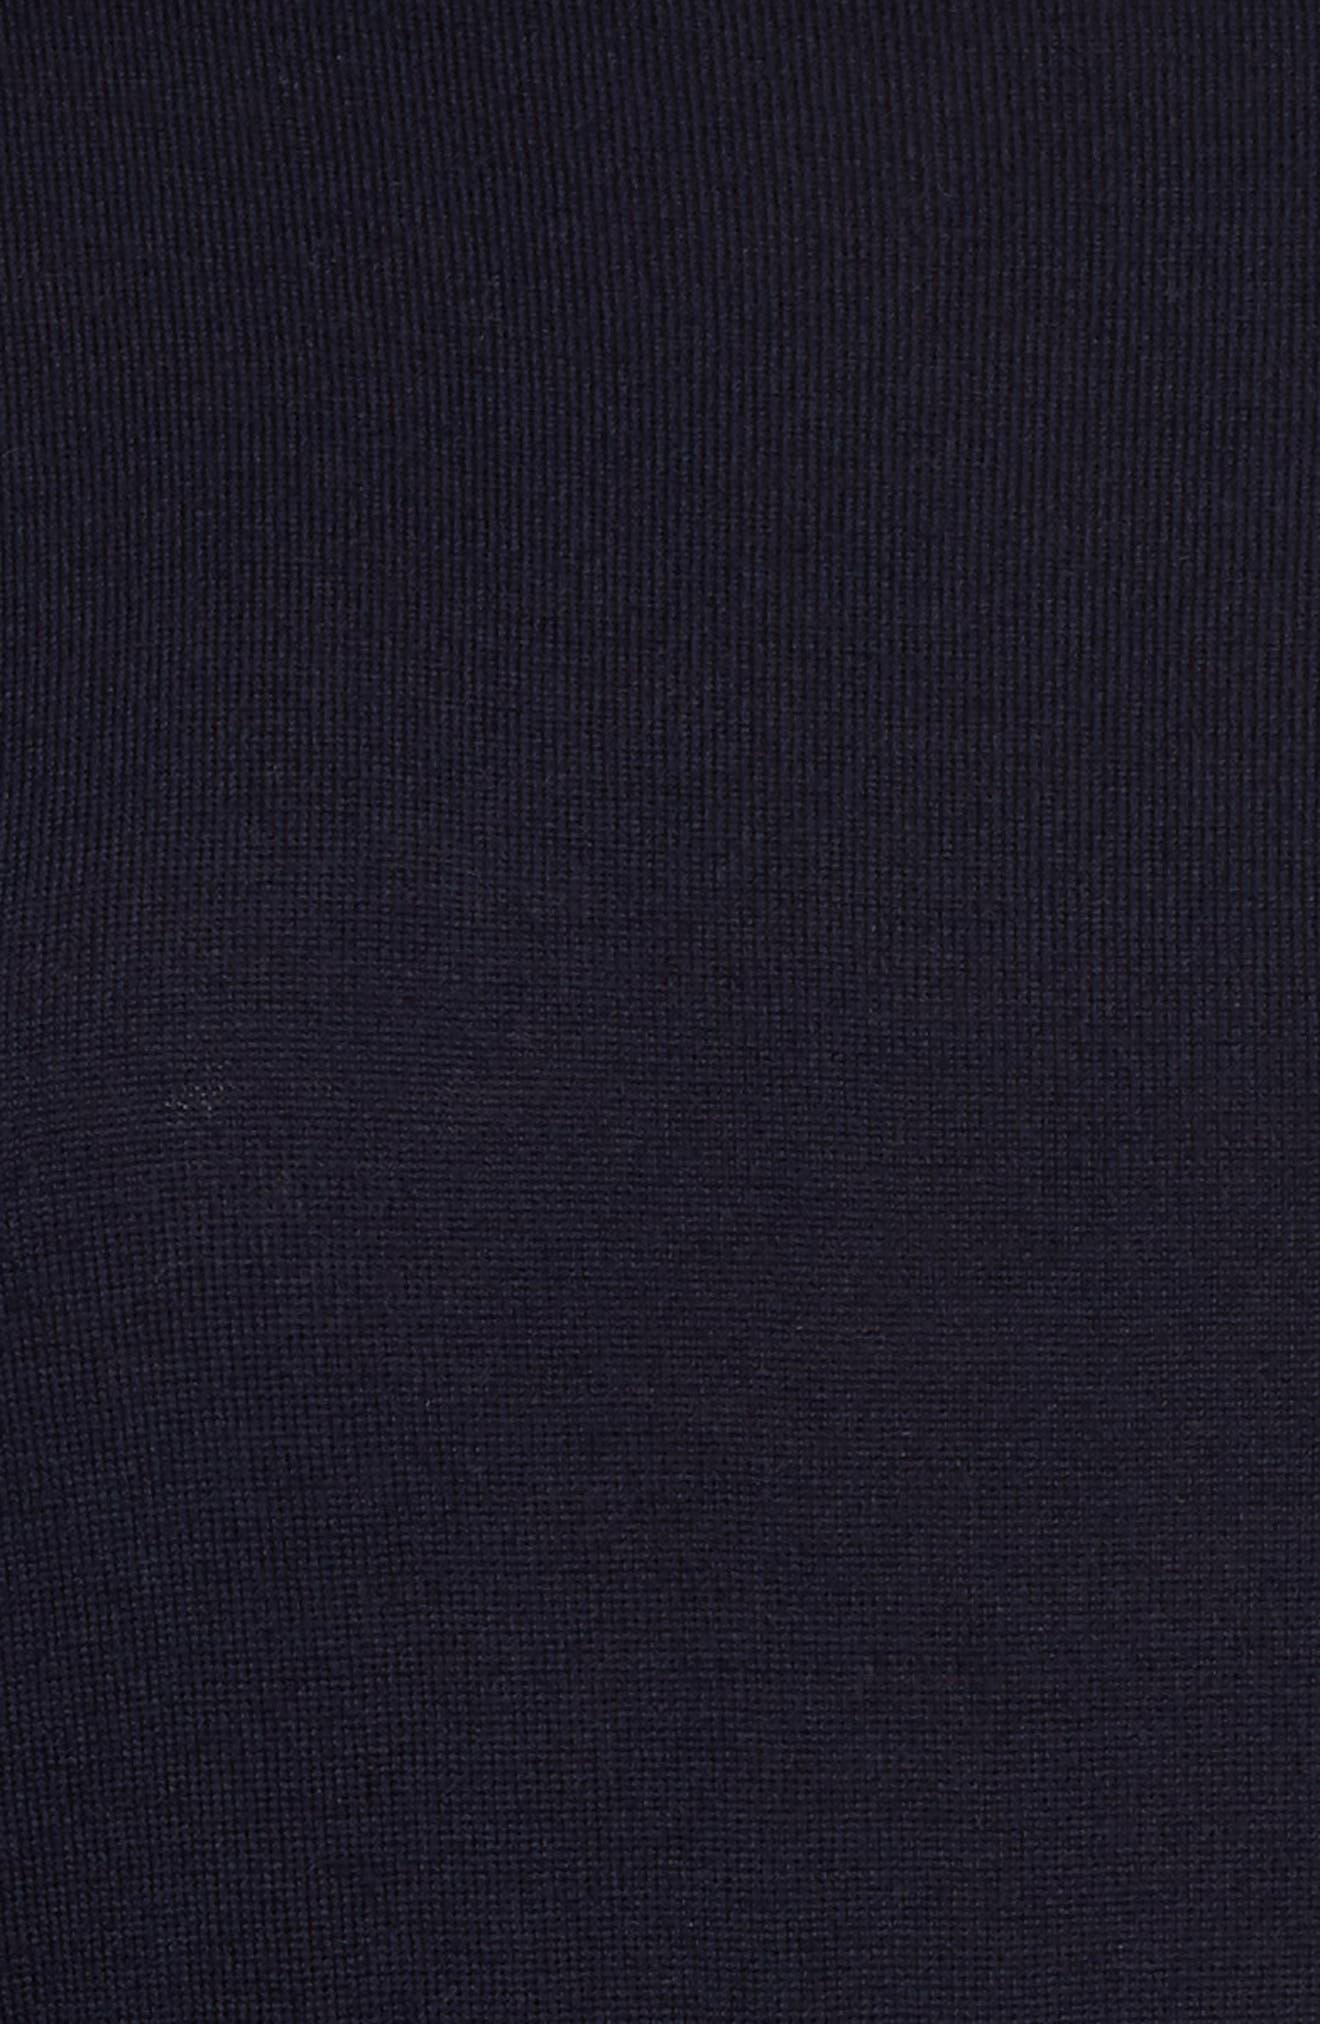 Split Cuff Merino Wool Turtleneck Sweater,                             Alternate thumbnail 14, color,